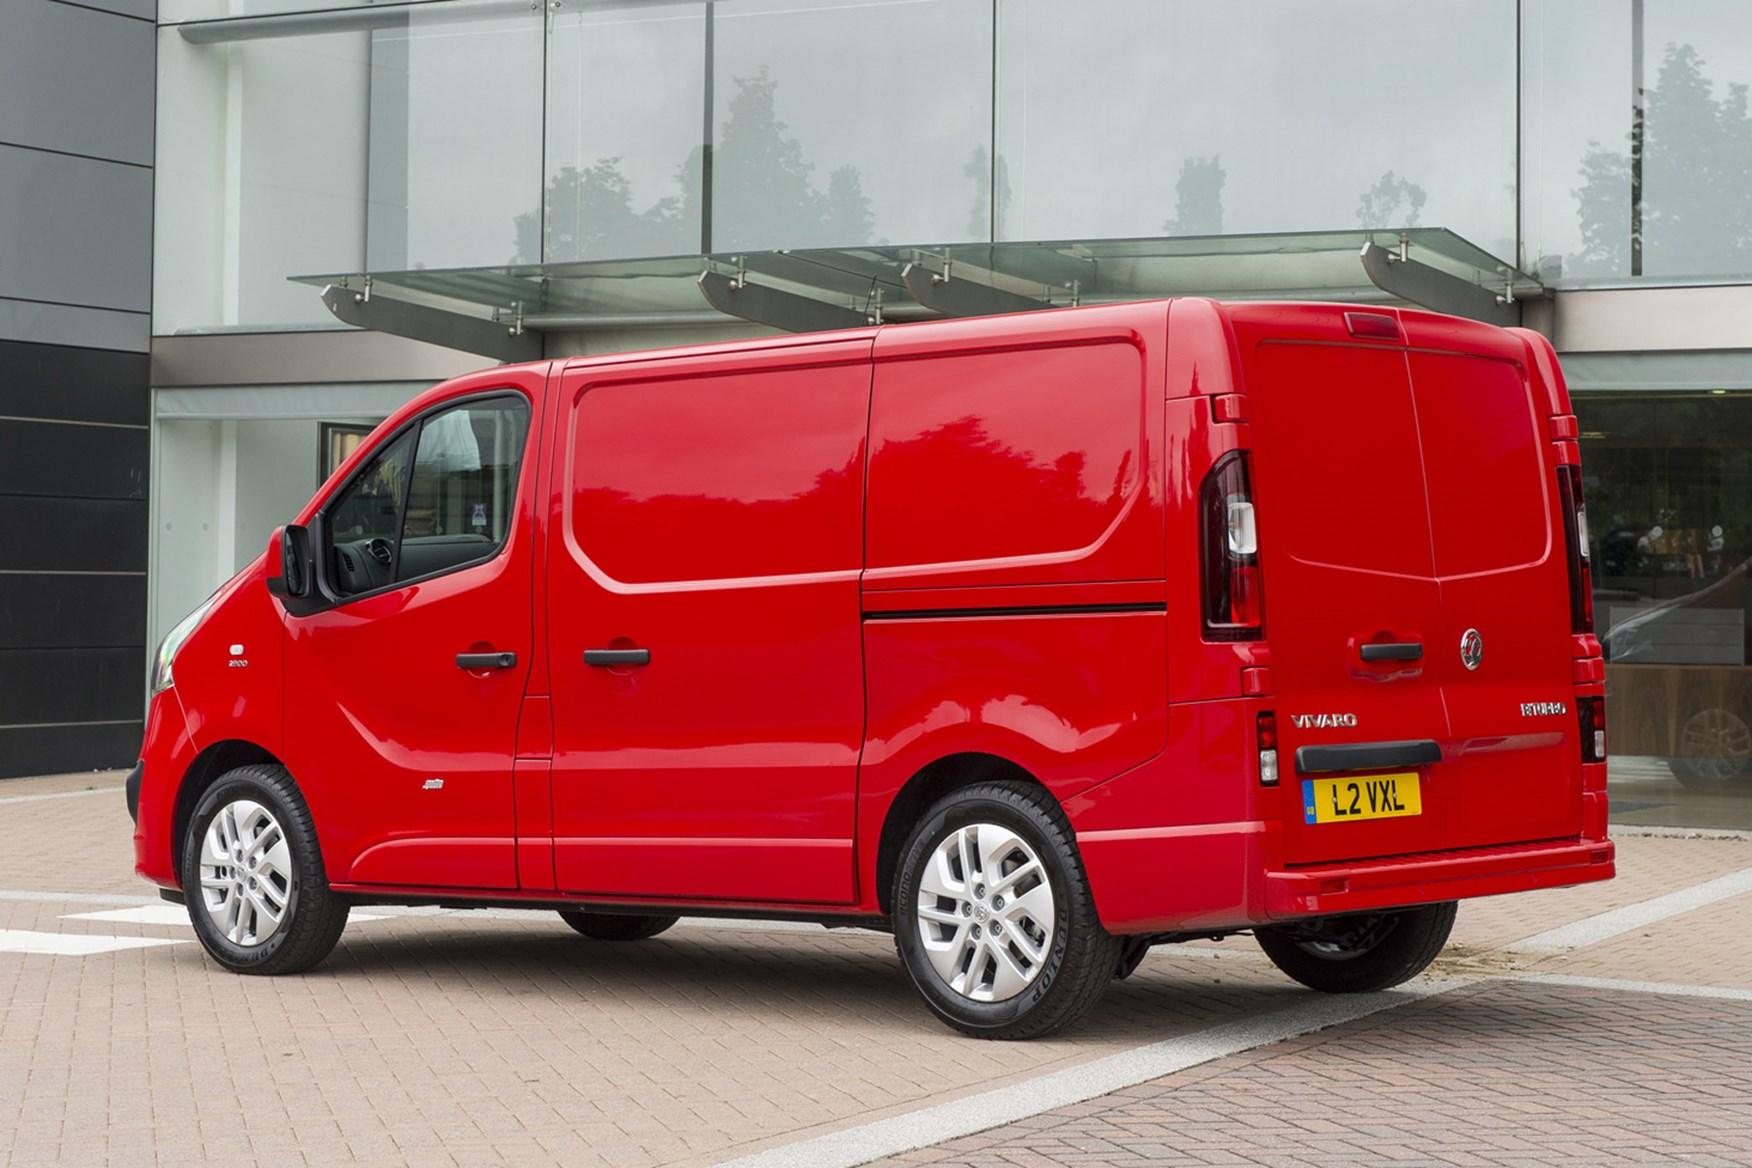 Vauxhall Vivaro - rear view, red